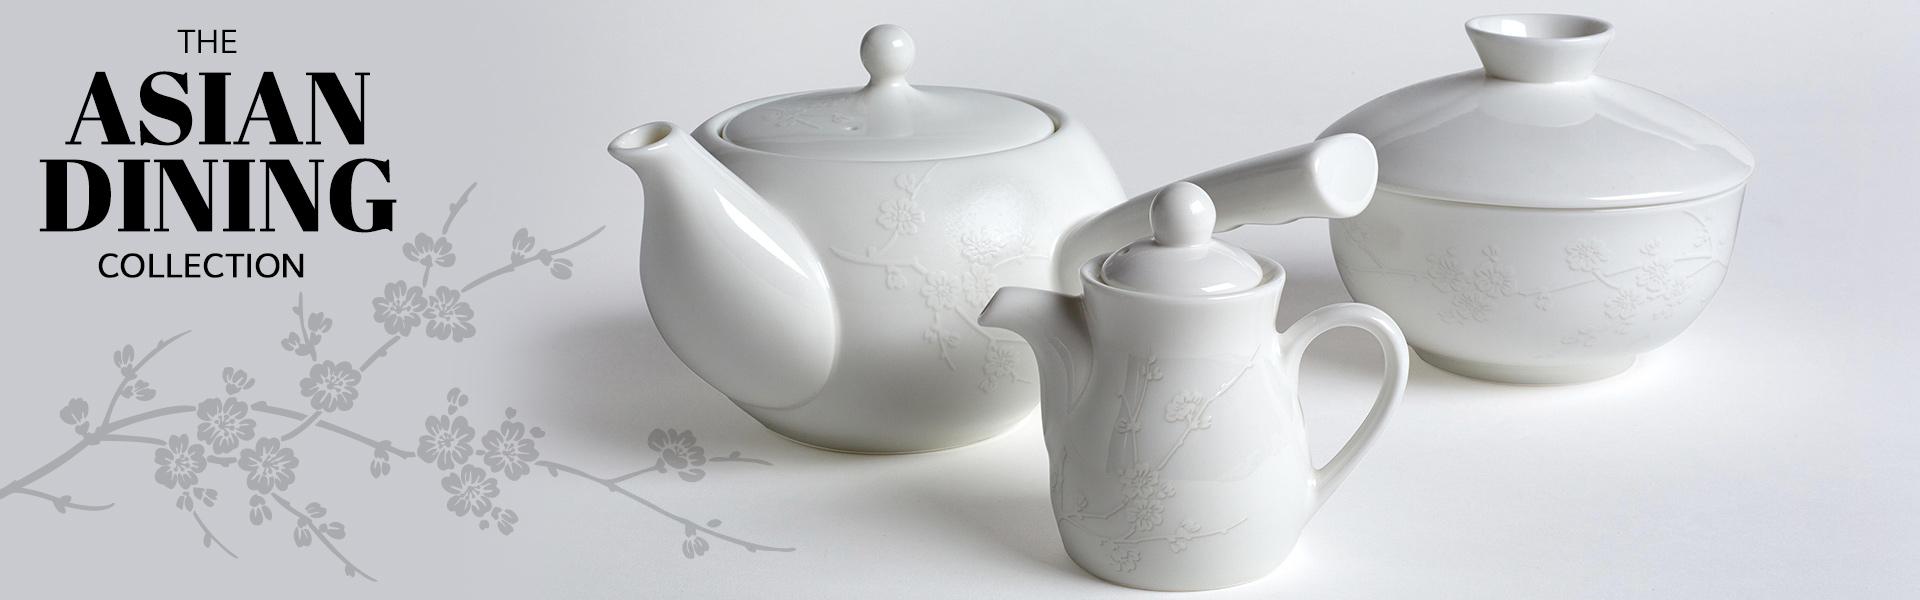 bone china oriental teapot, soy bottle and lidded bowl